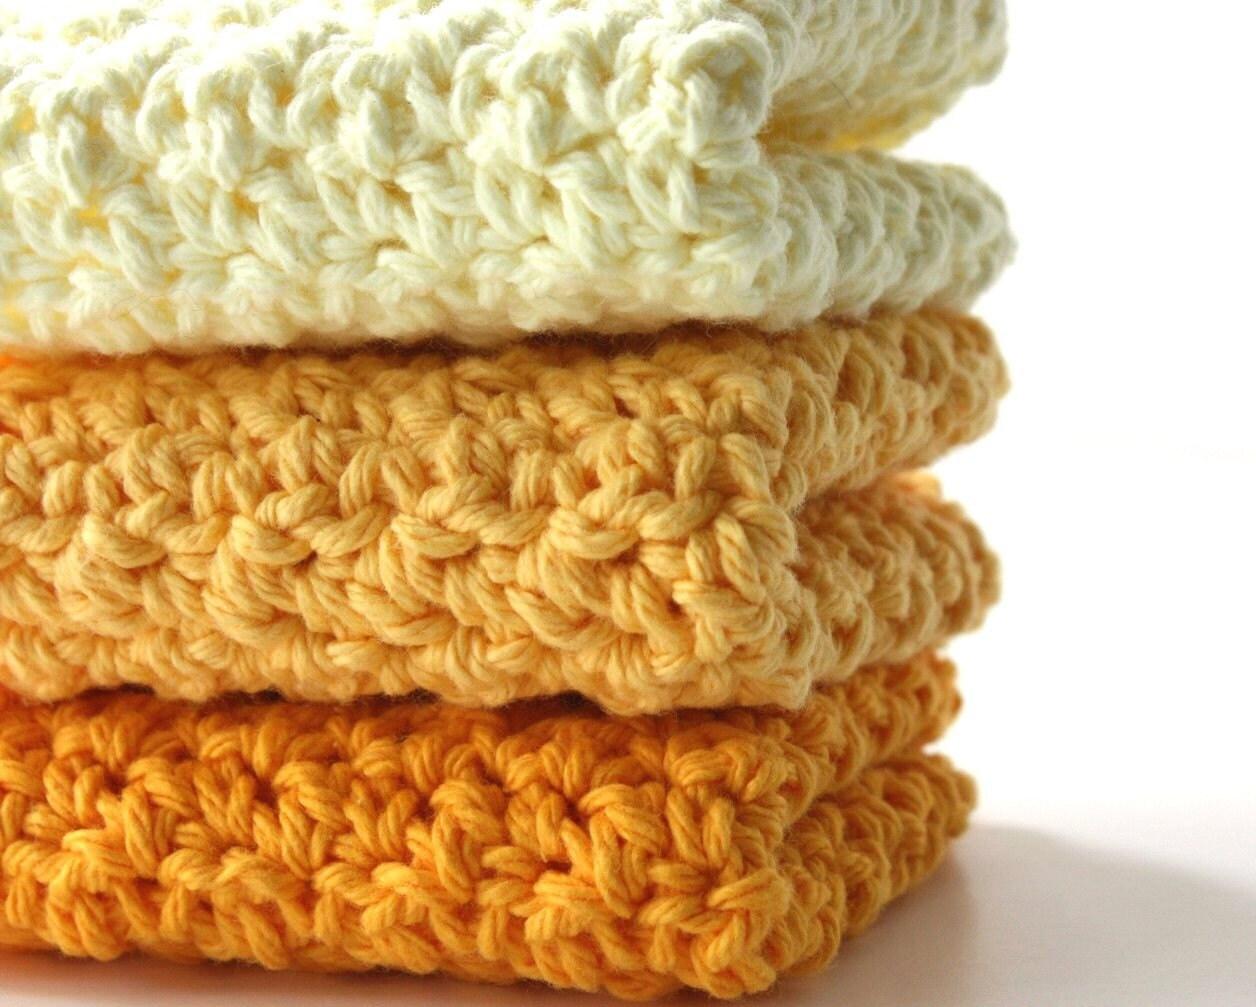 Crochet Cotton Dishcloths Sunshine Yellow